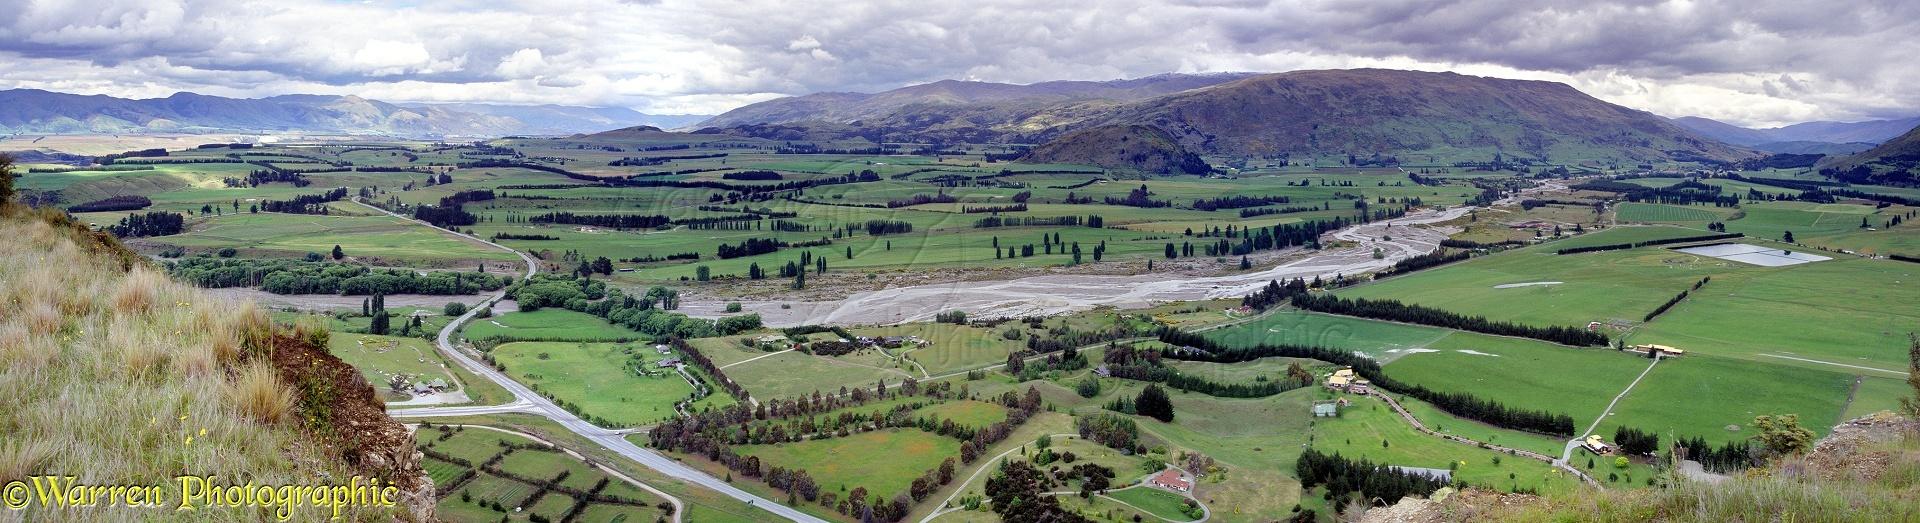 Rural New Zealand Panorama Photo Wp00835